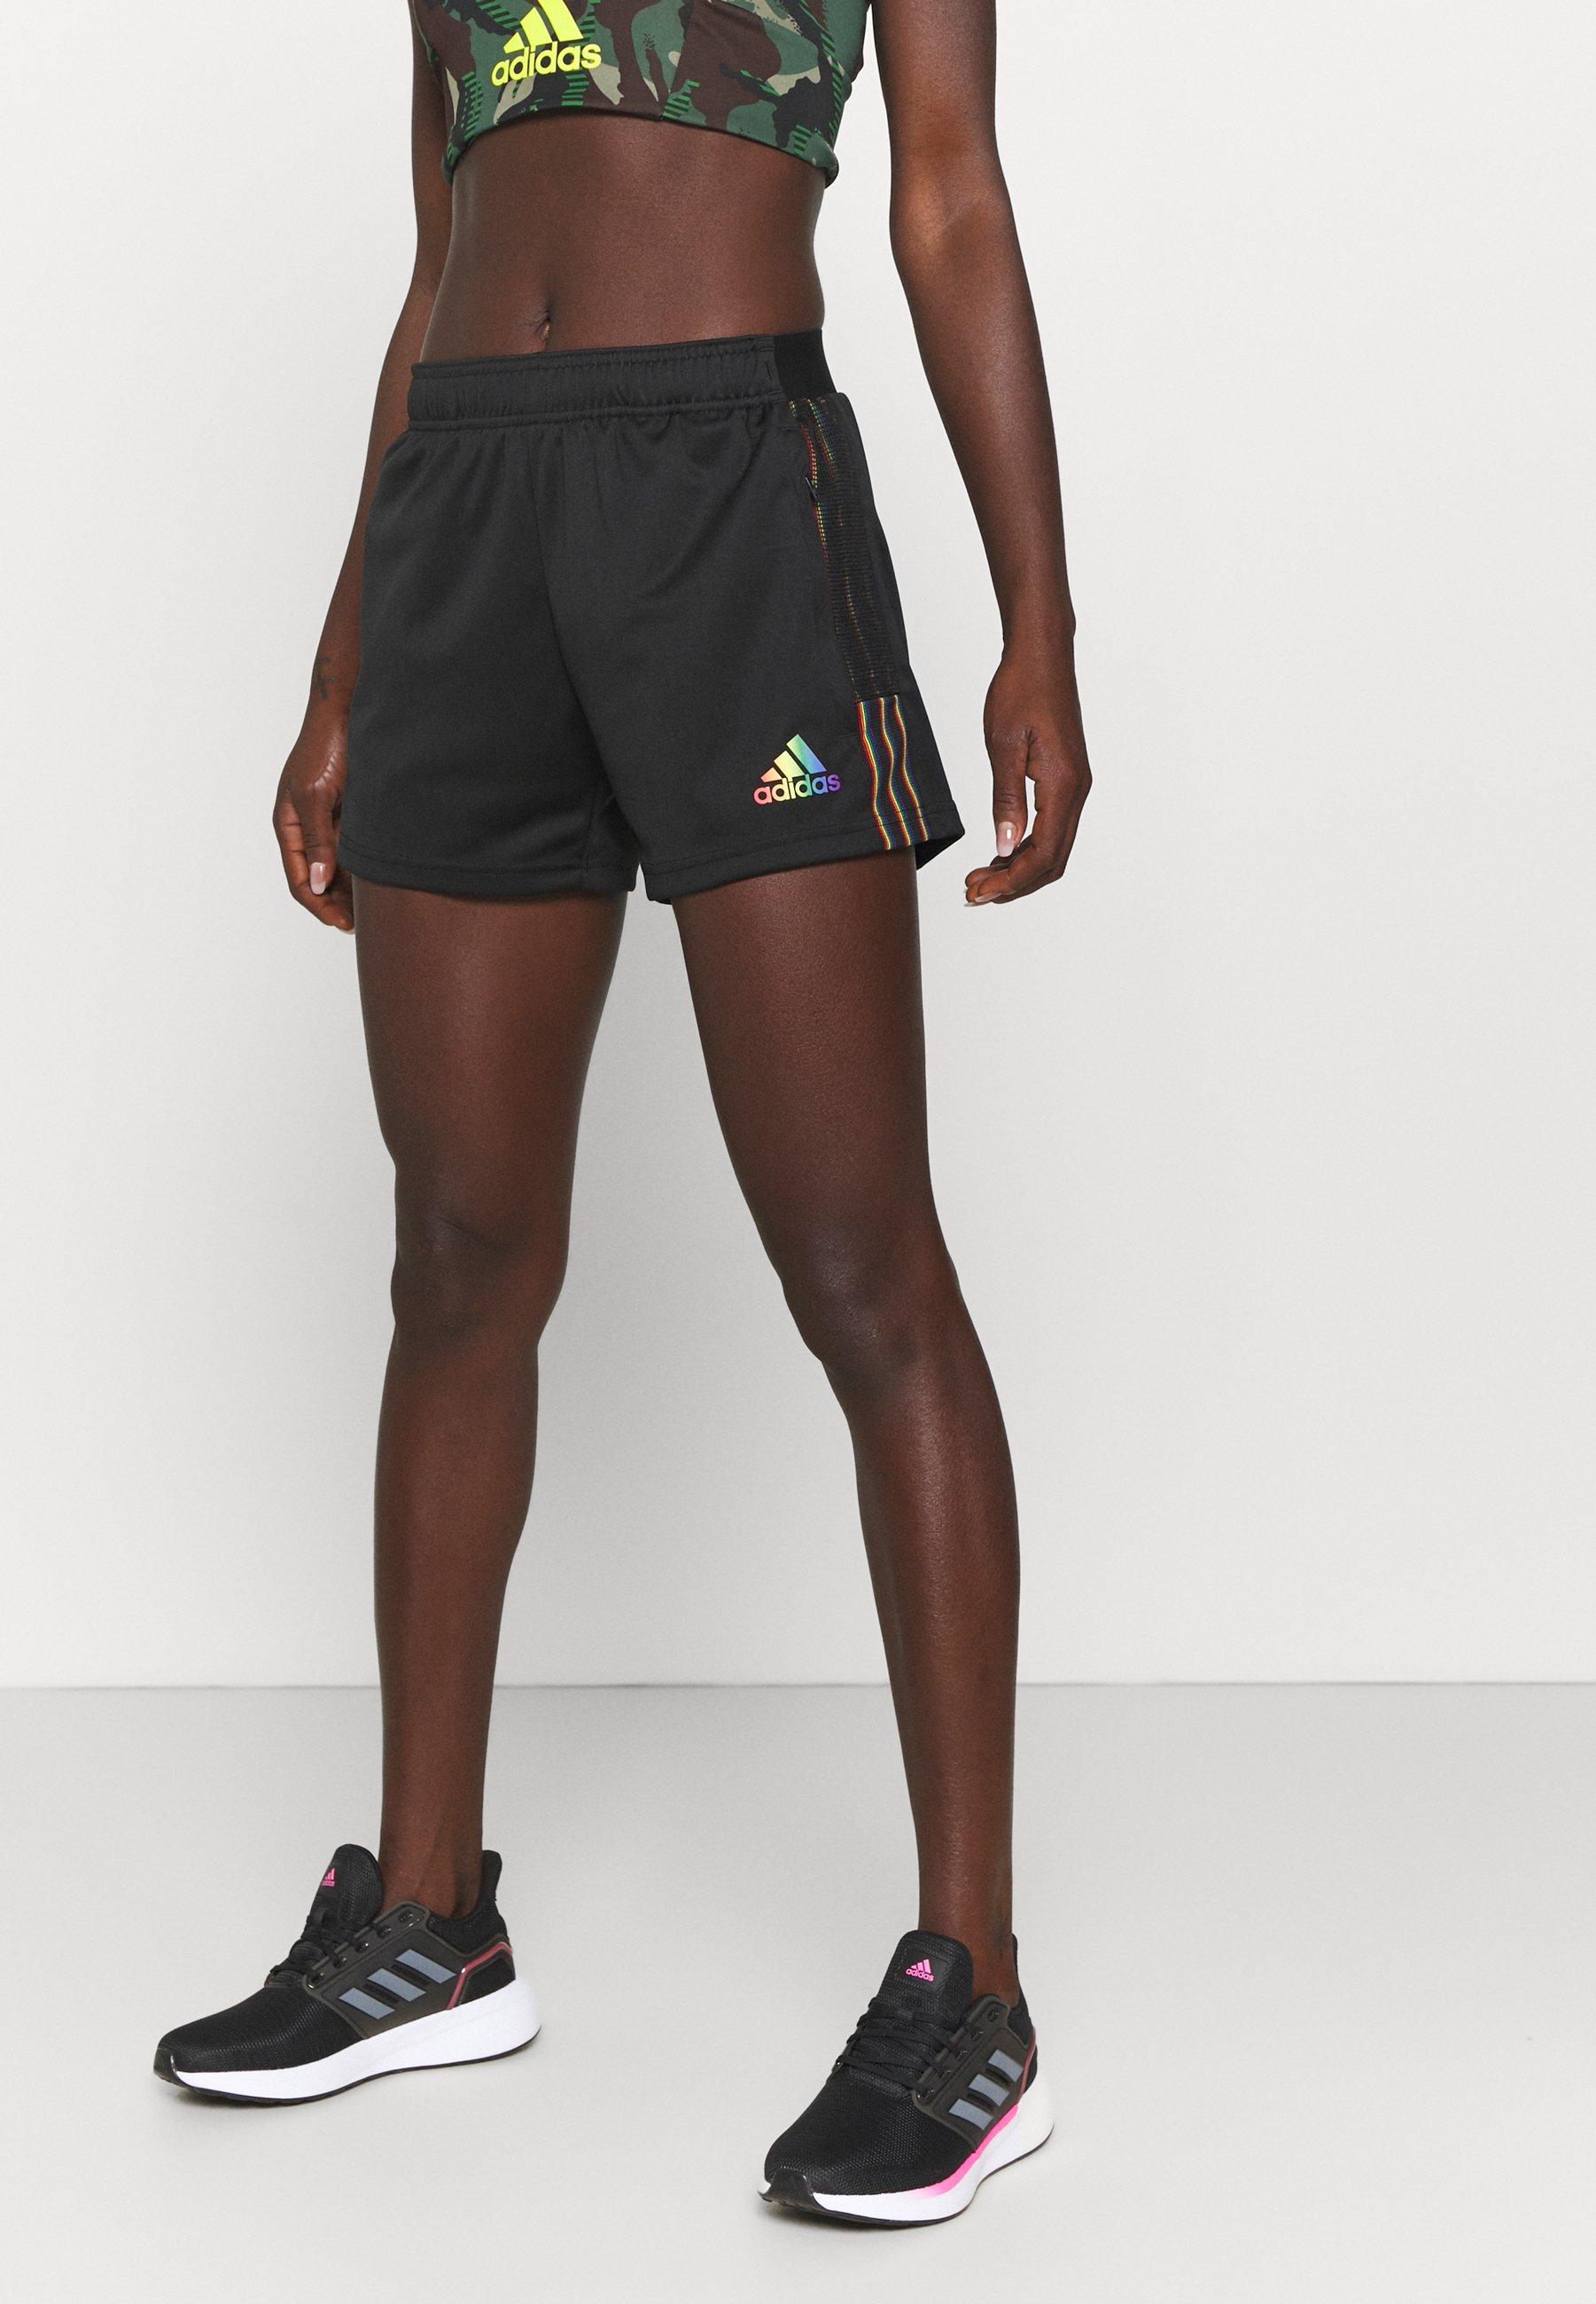 Damen TIRO PRIDE - kurze Sporthose